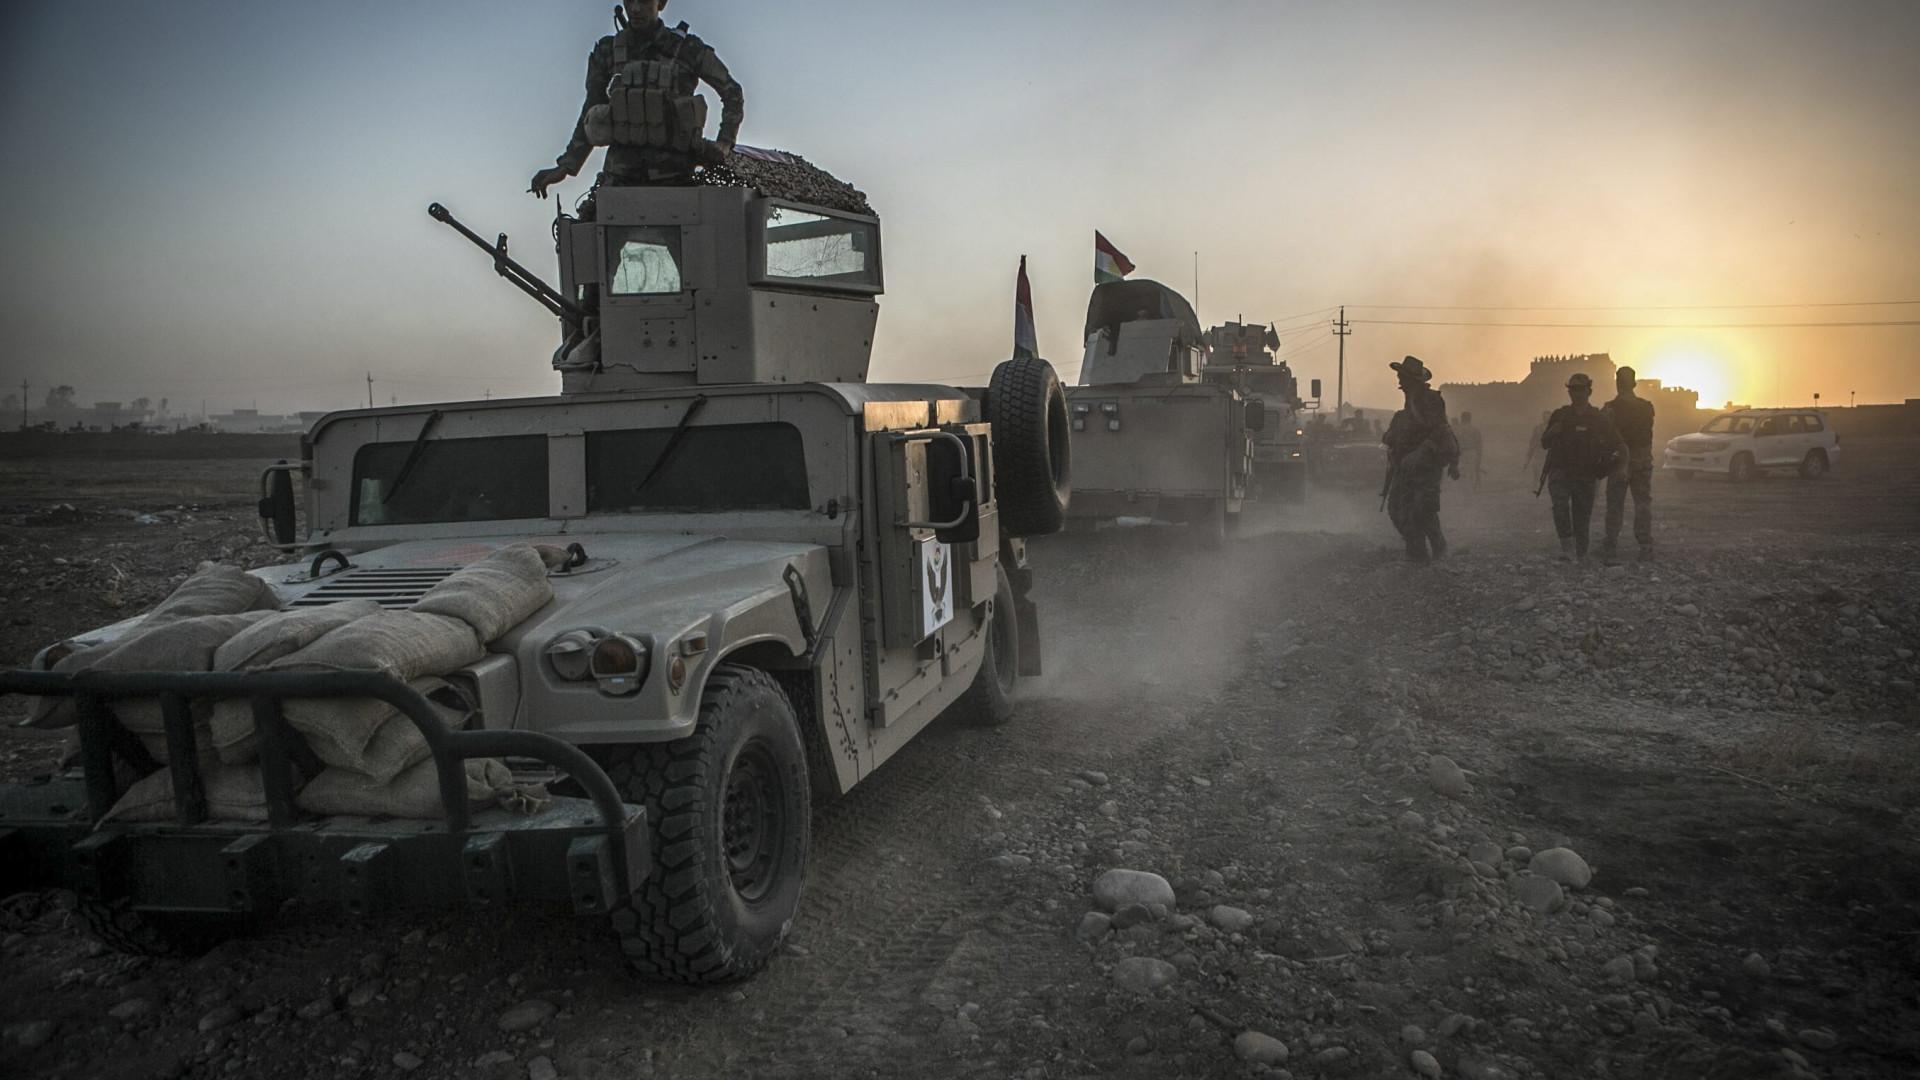 Amnistia alerta para necessidade de proteger civis na batalha de Mossul